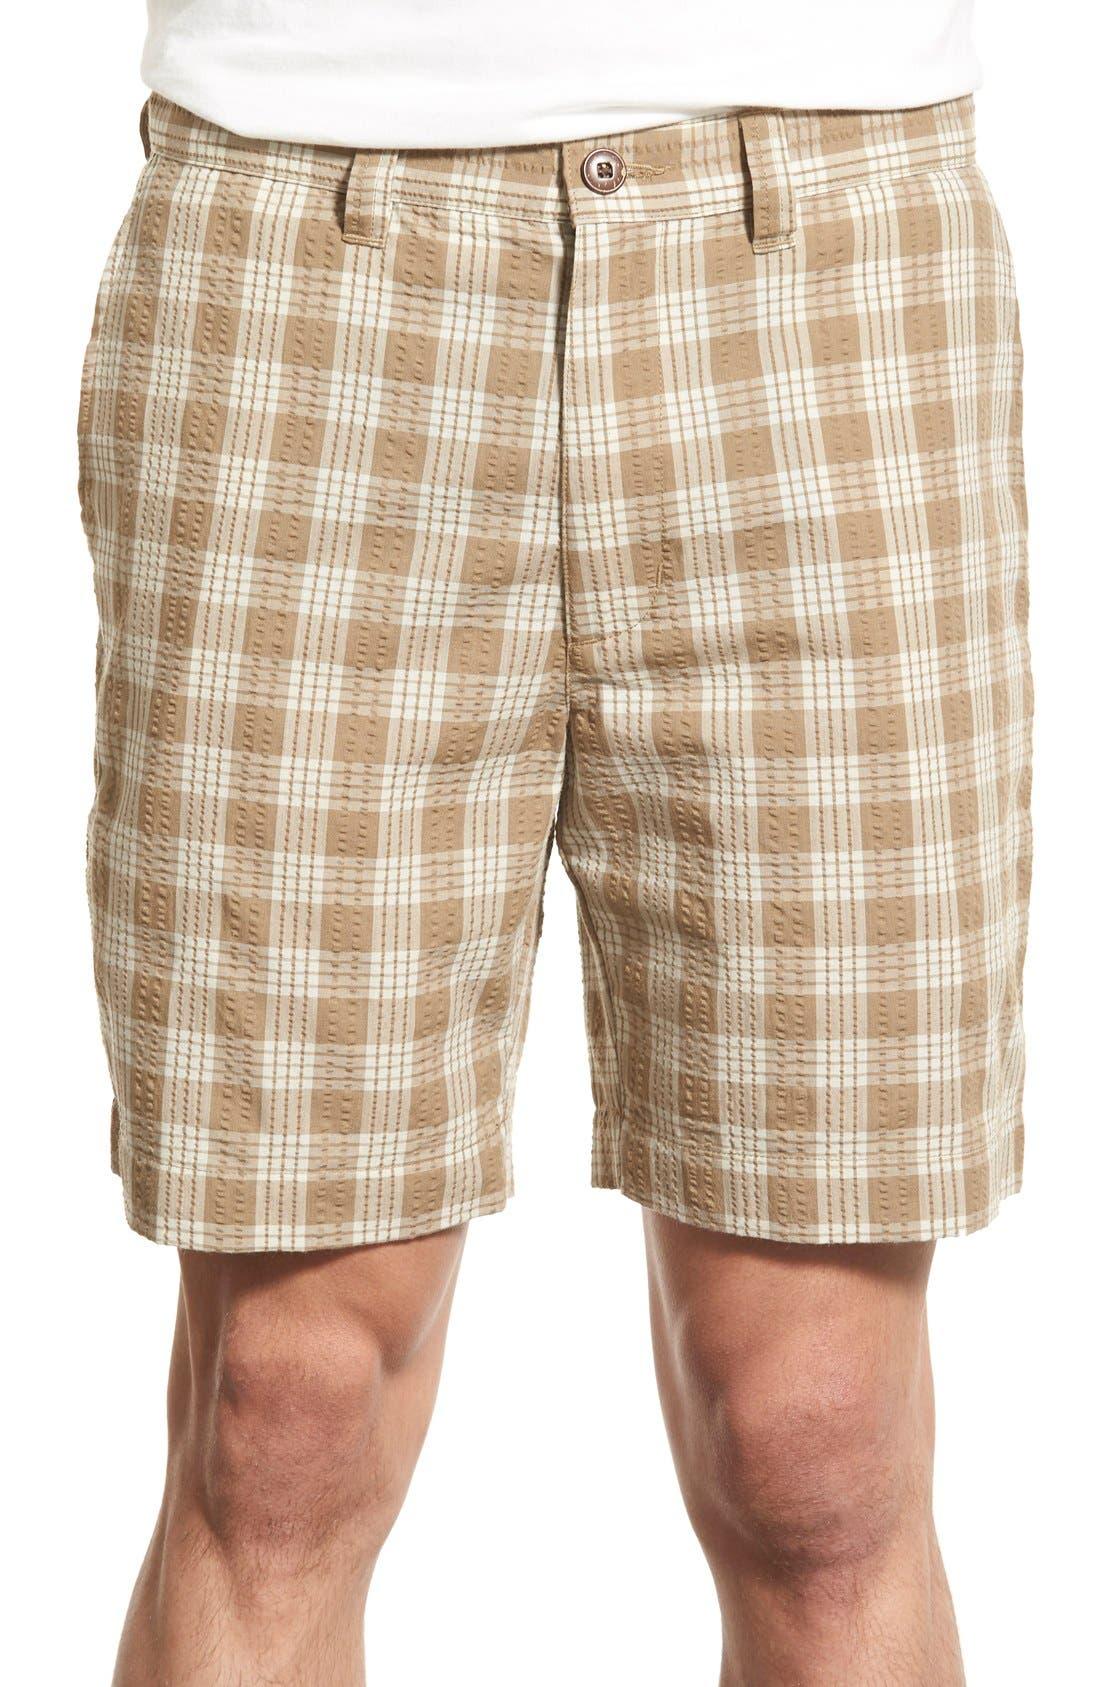 PATAGONIA 'Pucker' Seersucker Shorts